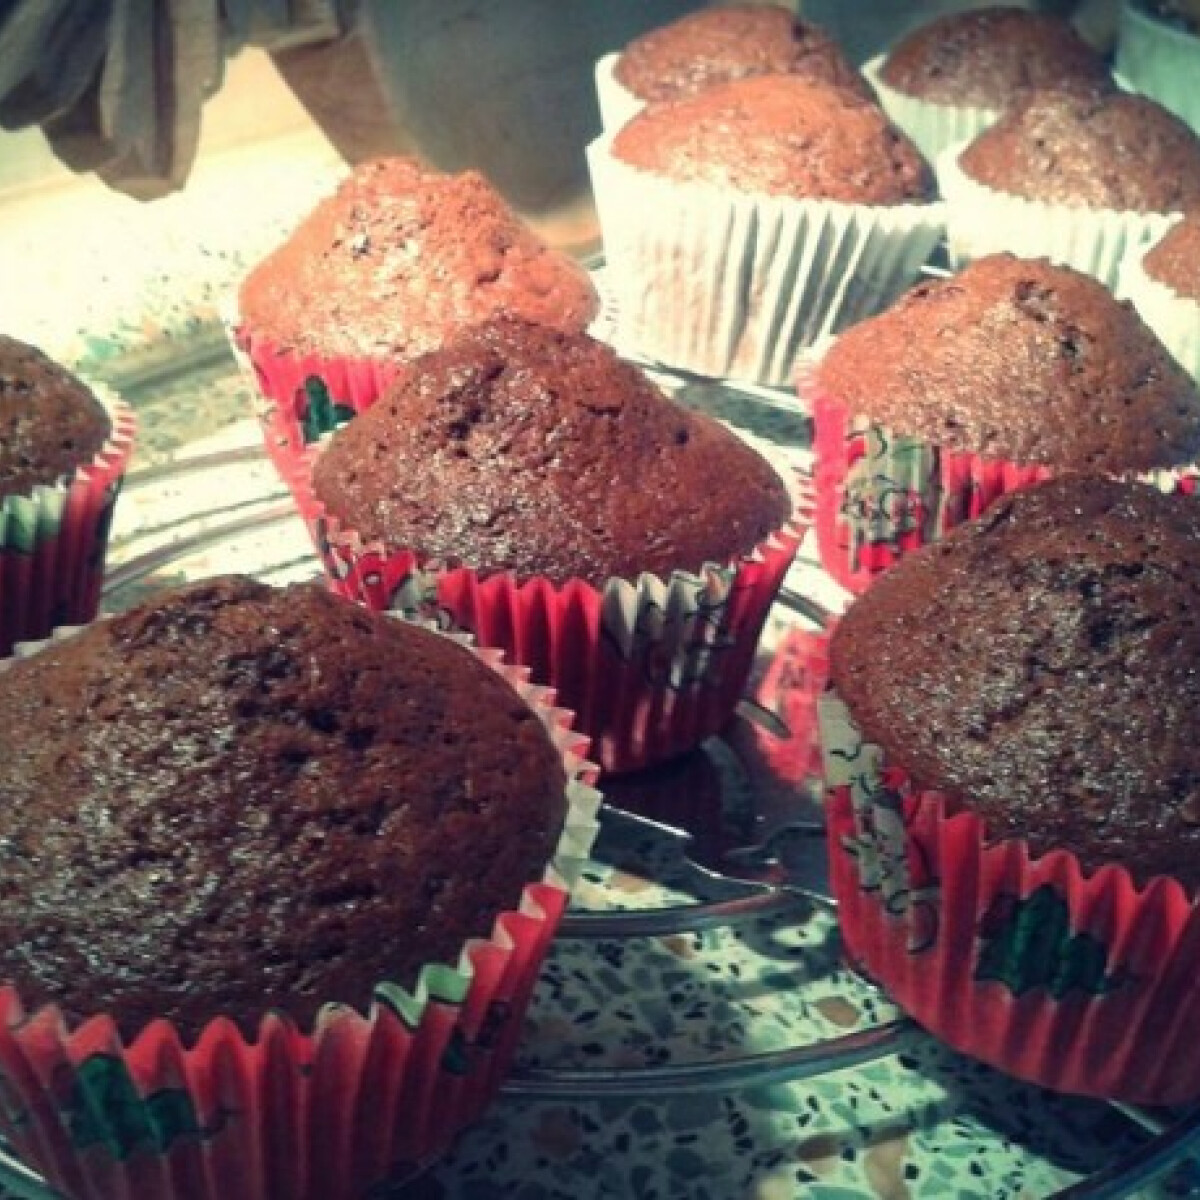 Csokis muffin Timejjától